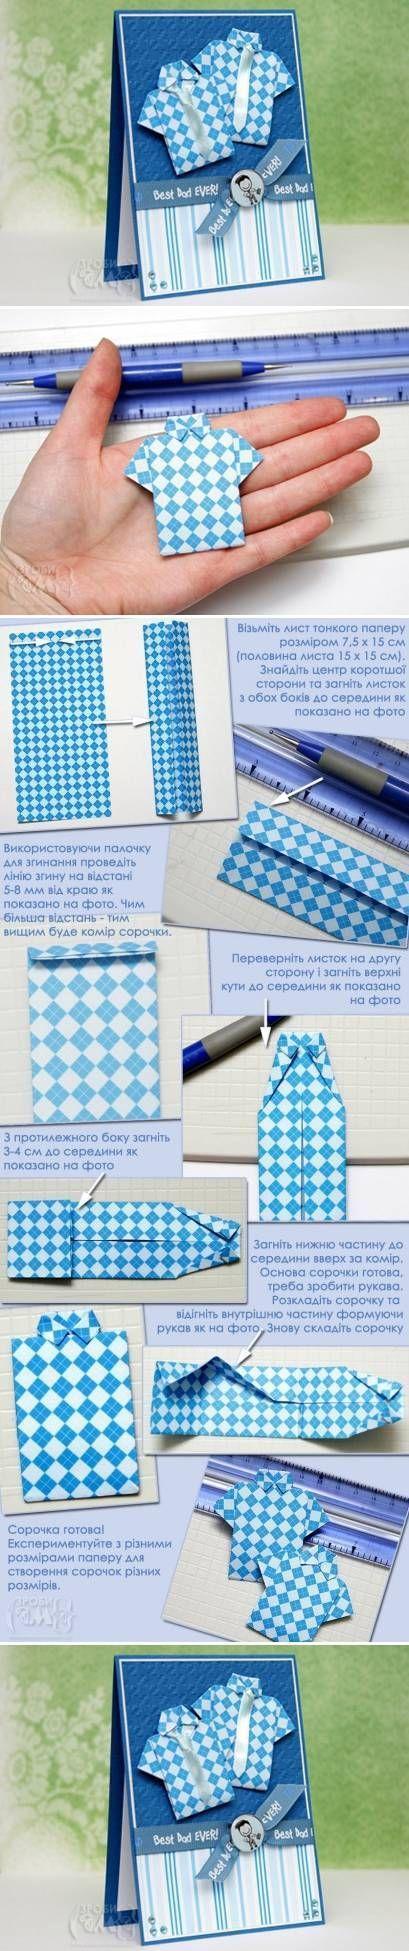 DIY Origami Shirt with Card DIY Projects   UsefulDIY.com